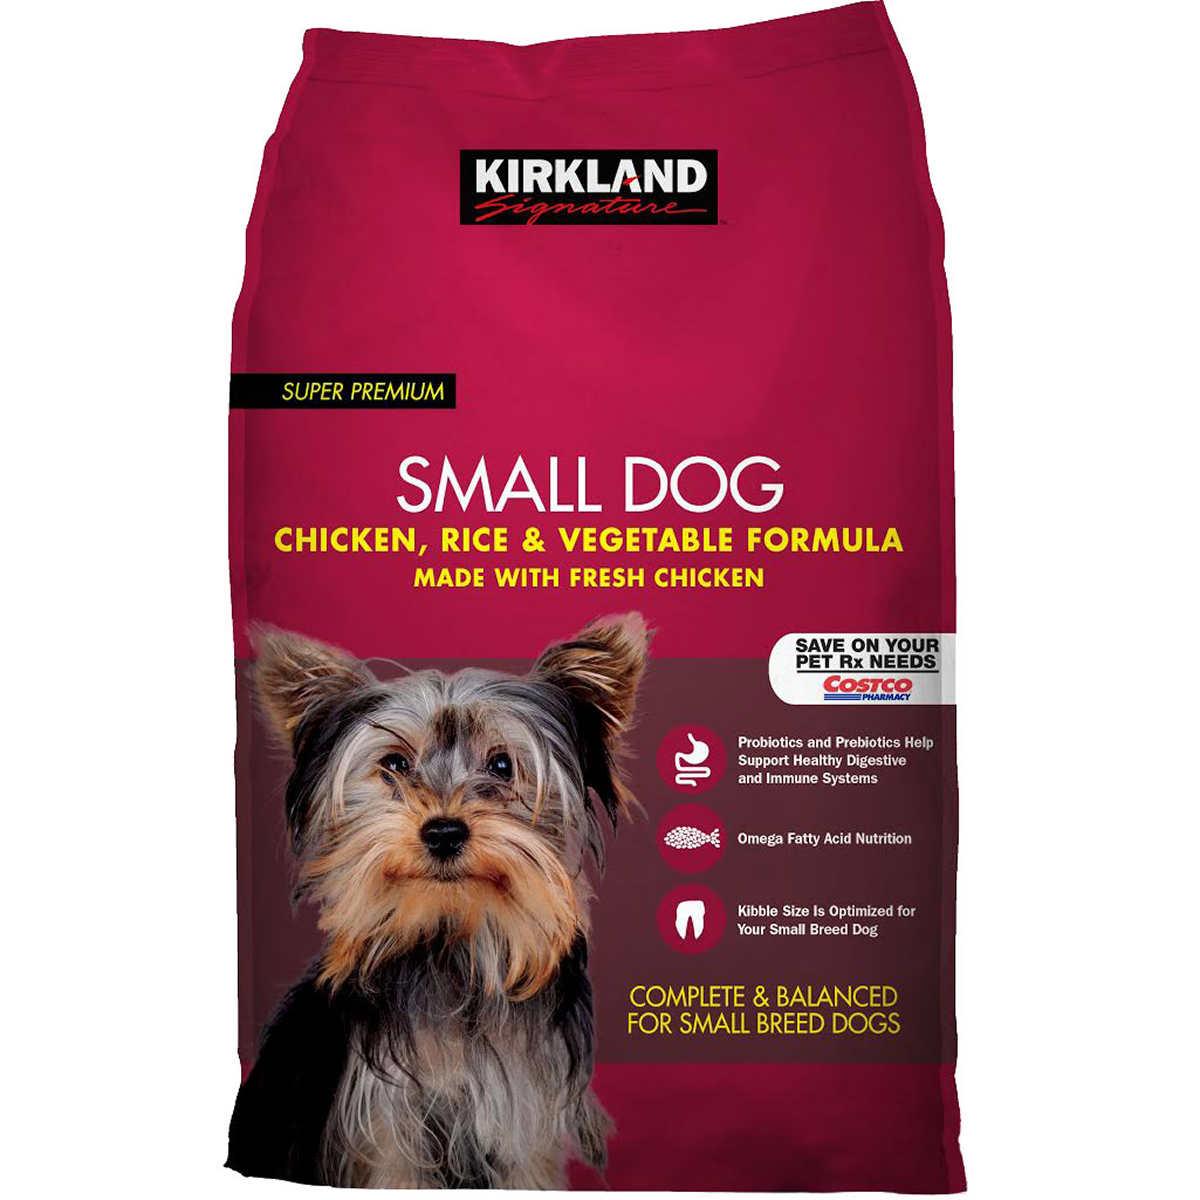 Kirkland Signature Small Formula Chicken Vegetable Dog Food 20 Lb